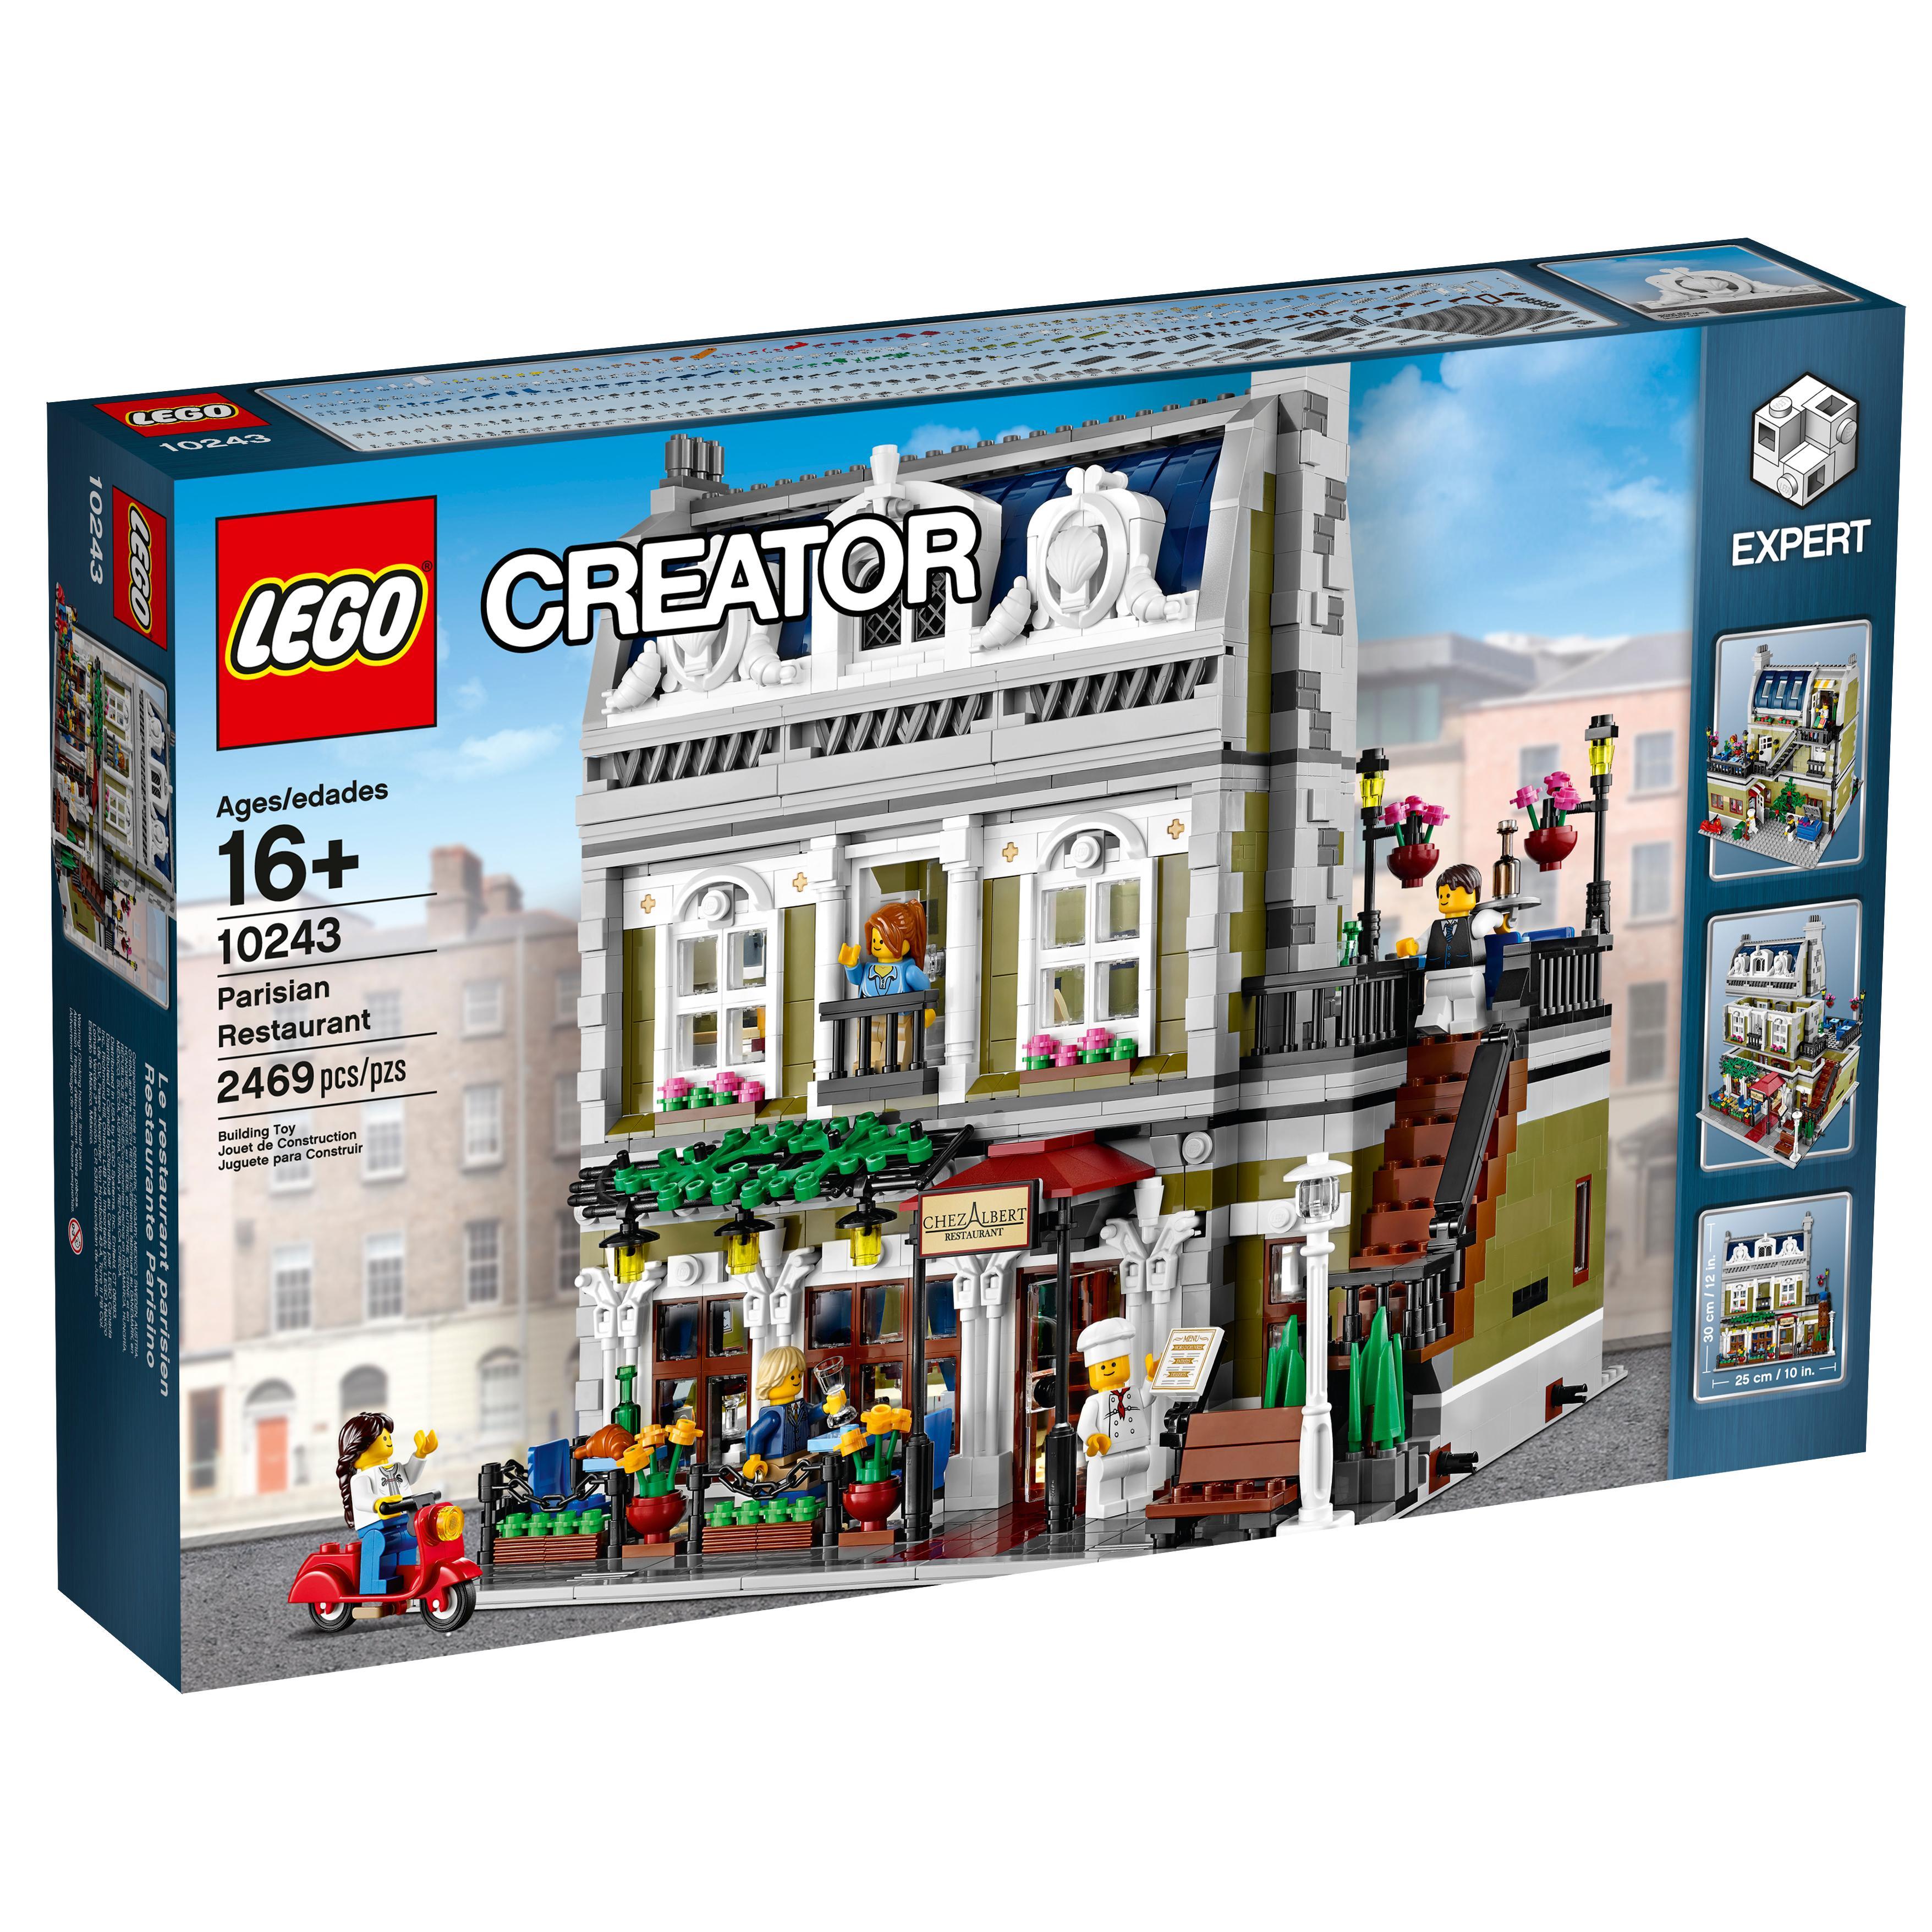 lego creator expert 10243 parisian restaurant toys games. Black Bedroom Furniture Sets. Home Design Ideas